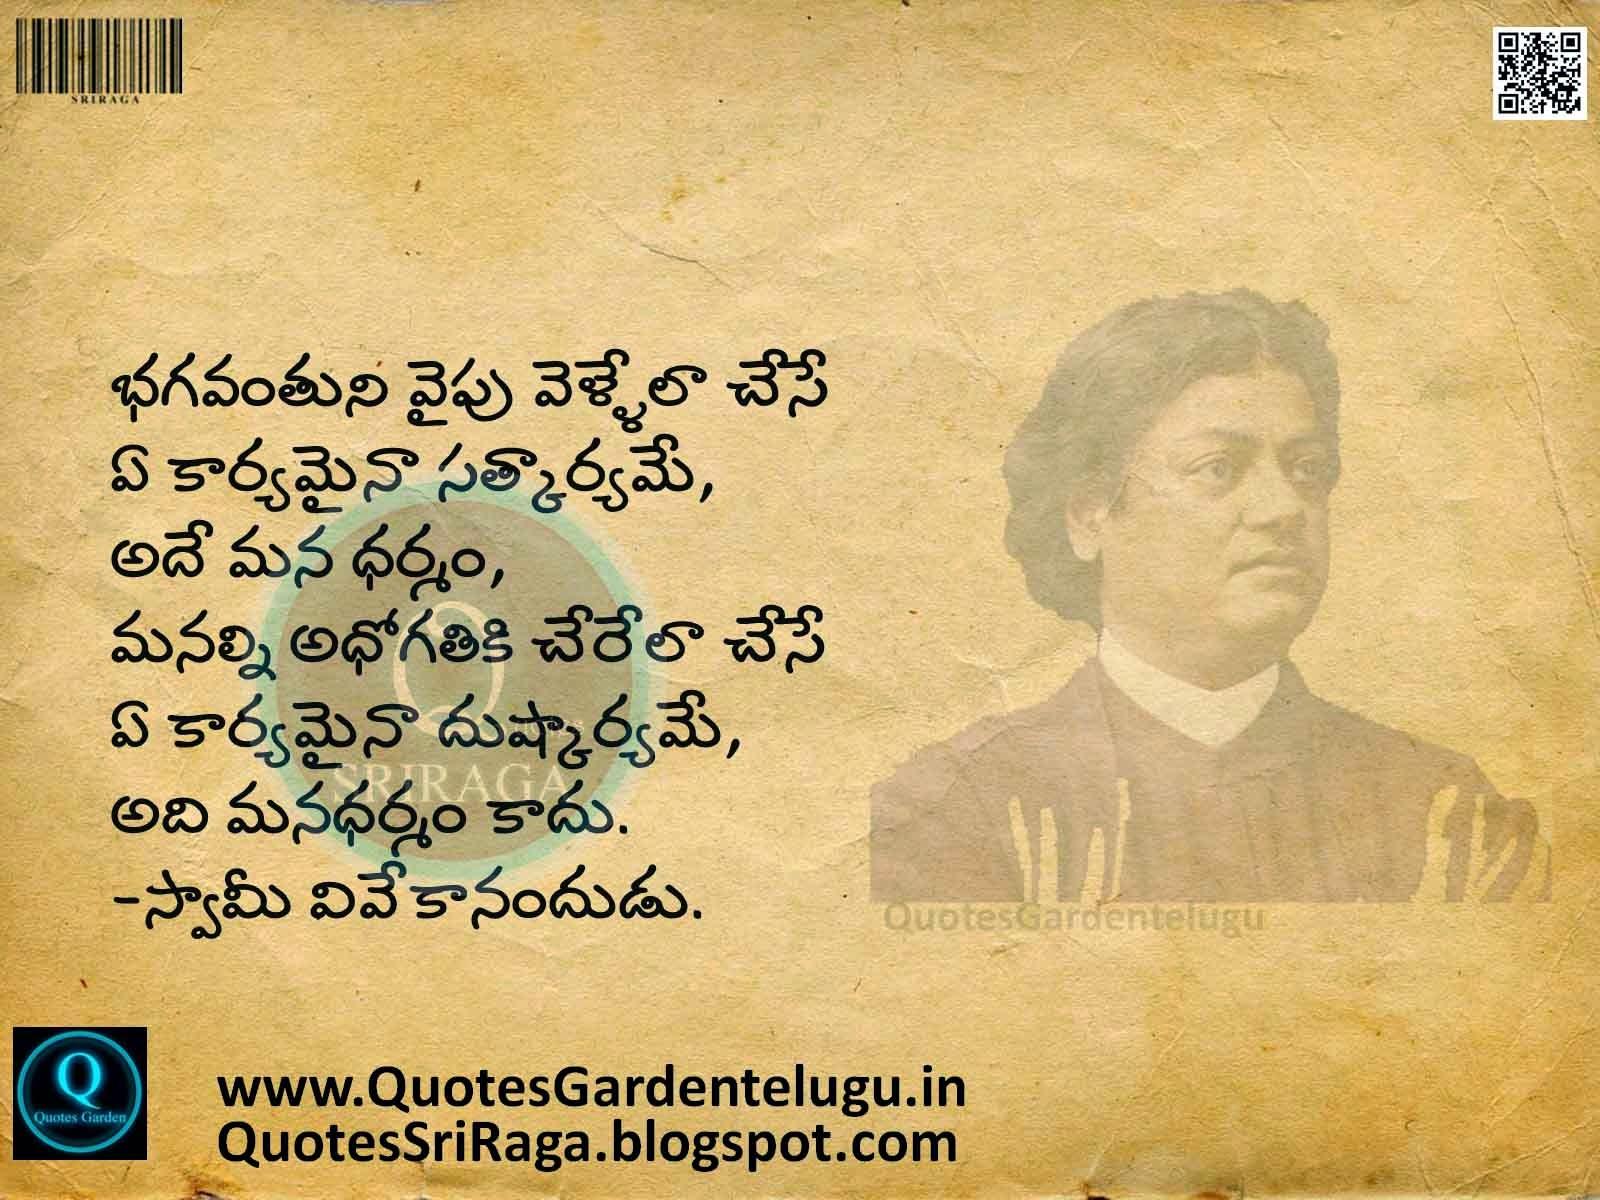 Vivekananda telugu quotes - Vivekananda Best Inpsirational quotes - Vivekananda inspirational quotes in telugu - Vivekanda Good Reads Vivekananda Best Inspirational Quotes HDwallpapers Vivekananda Inspiring Quotes  images